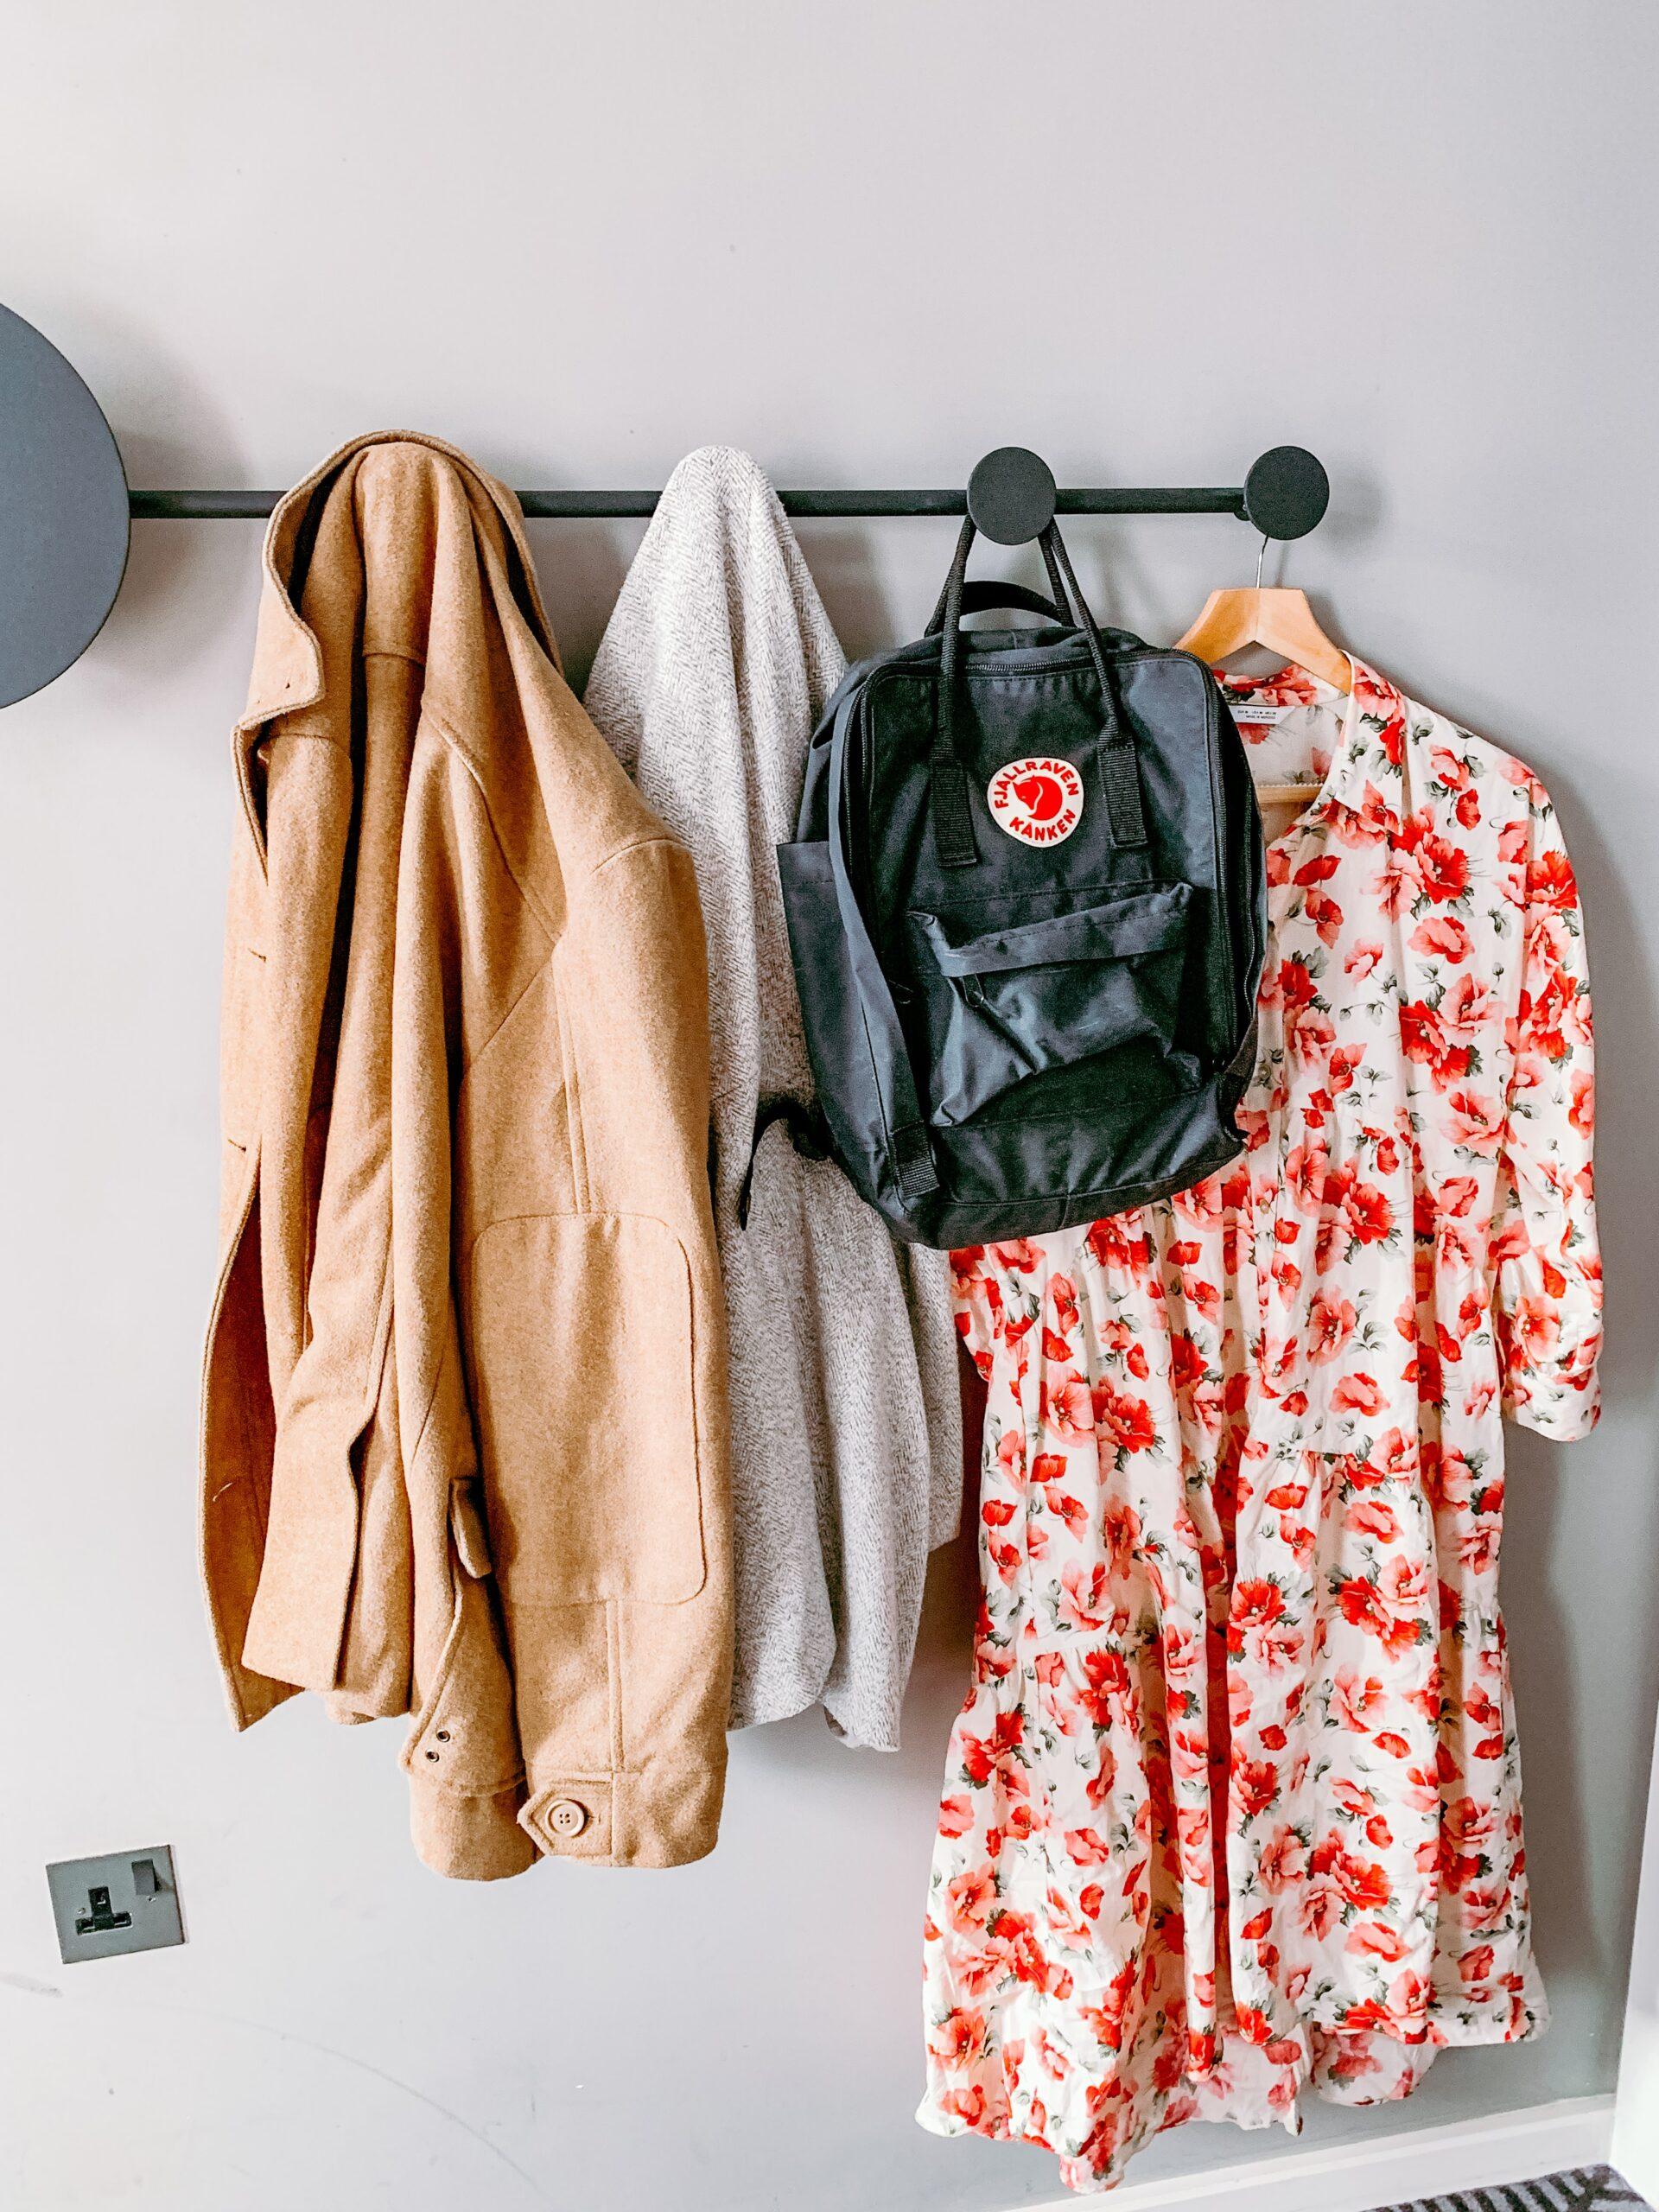 coats and backpack on hooks